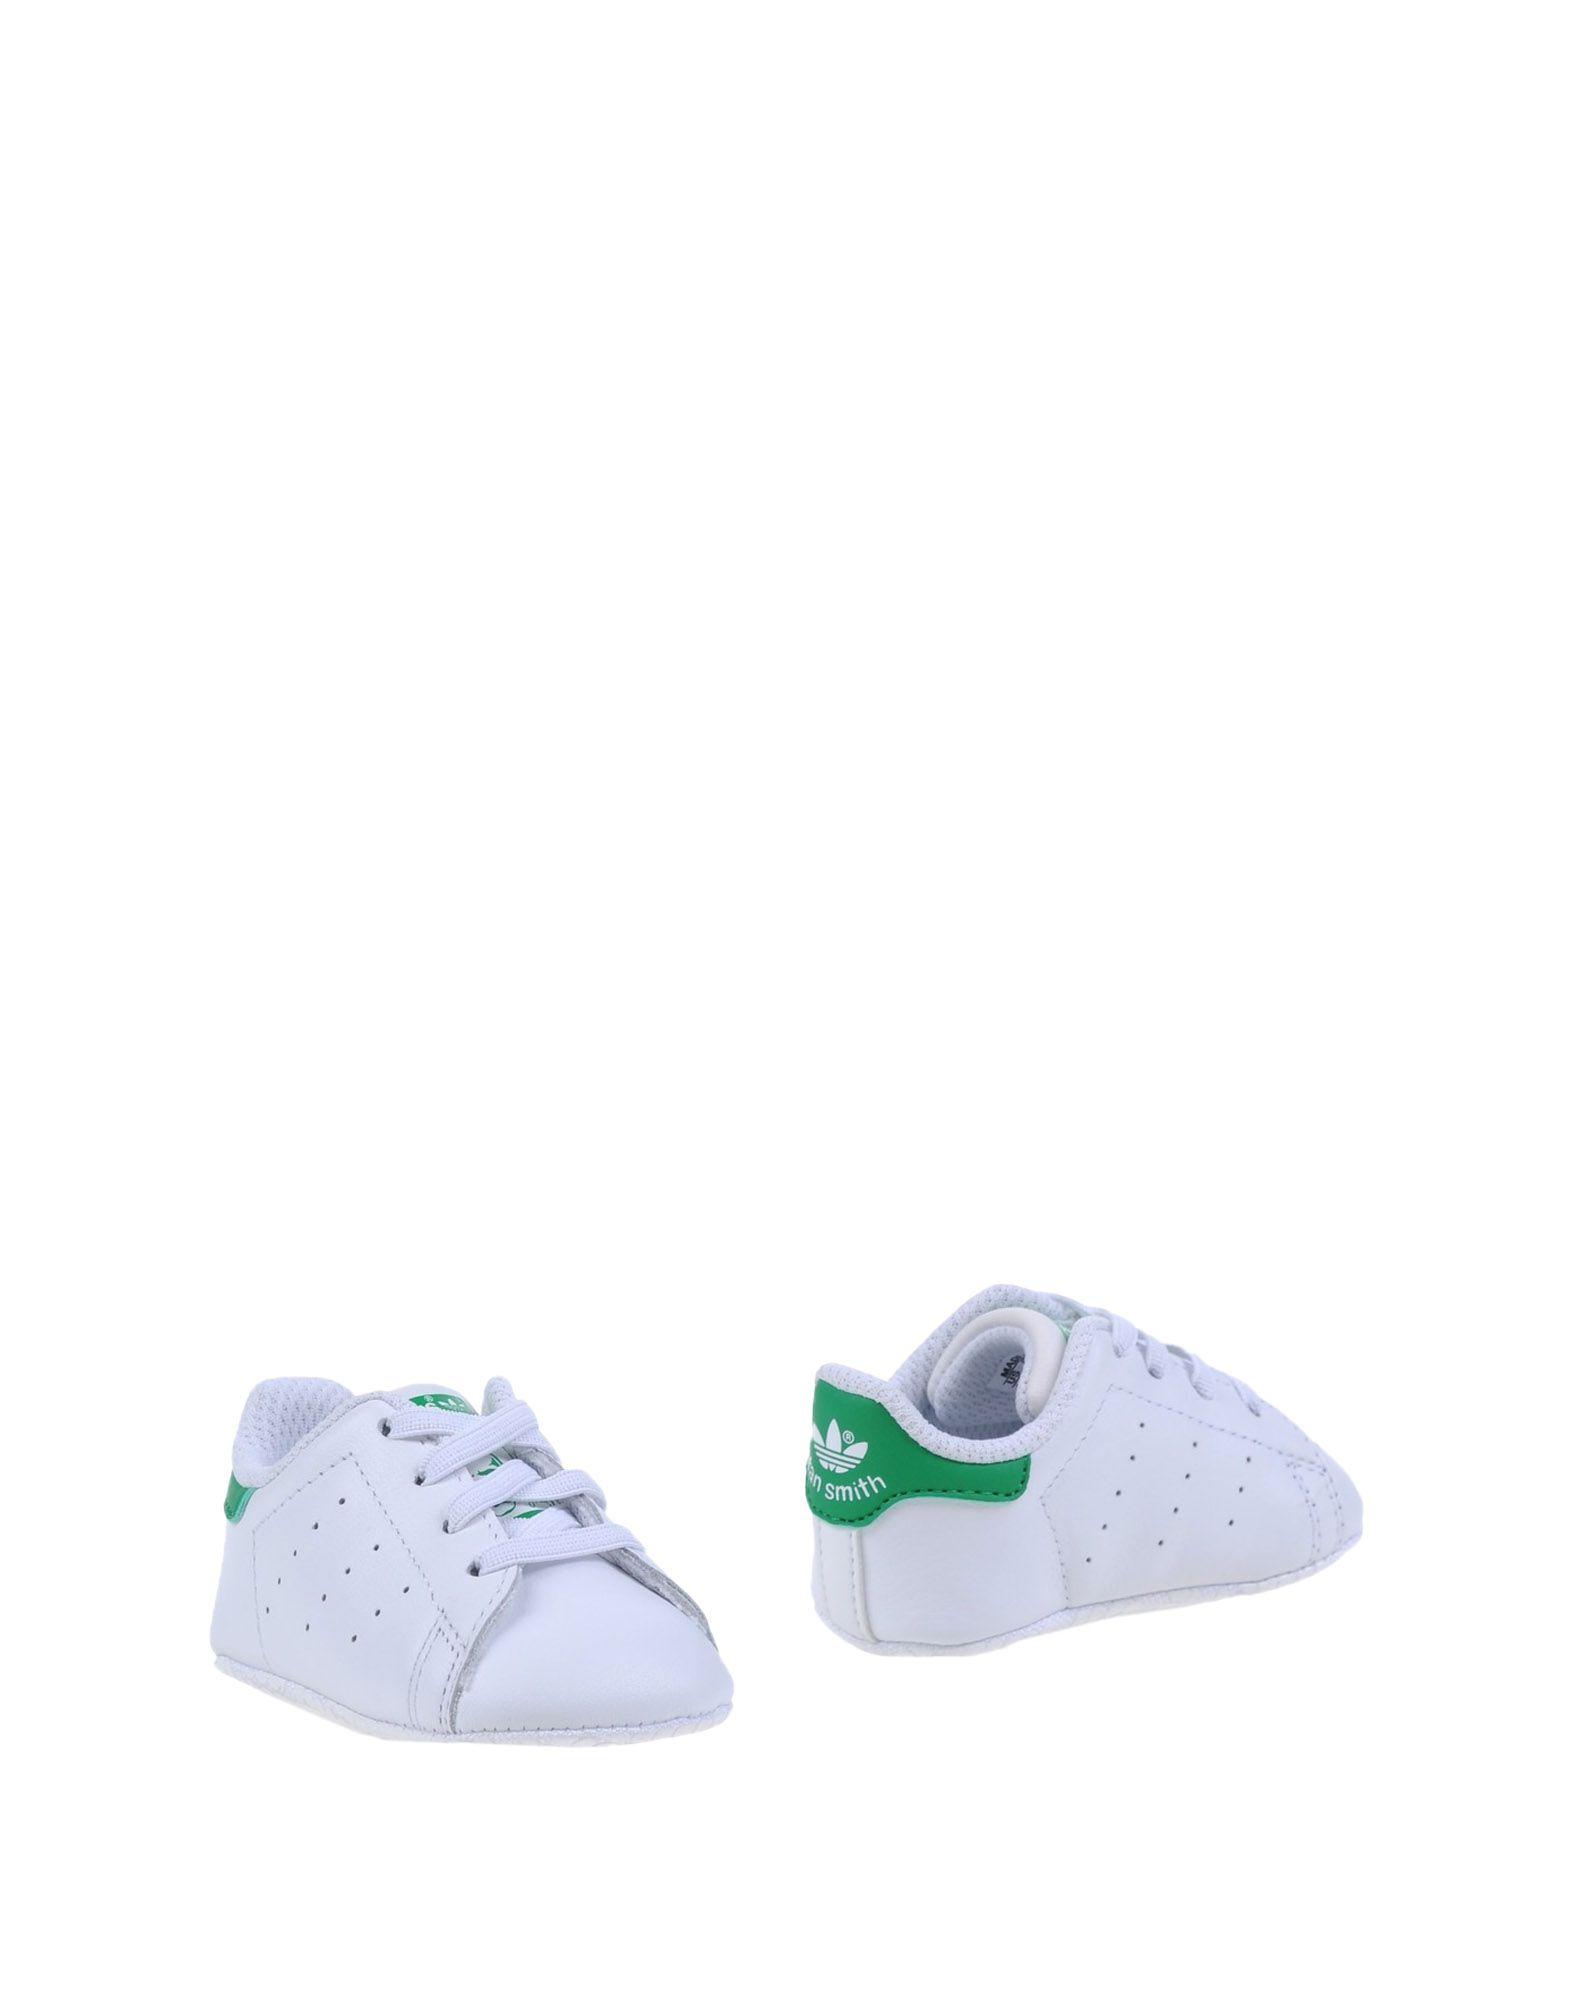 2adidas neonato scarpe